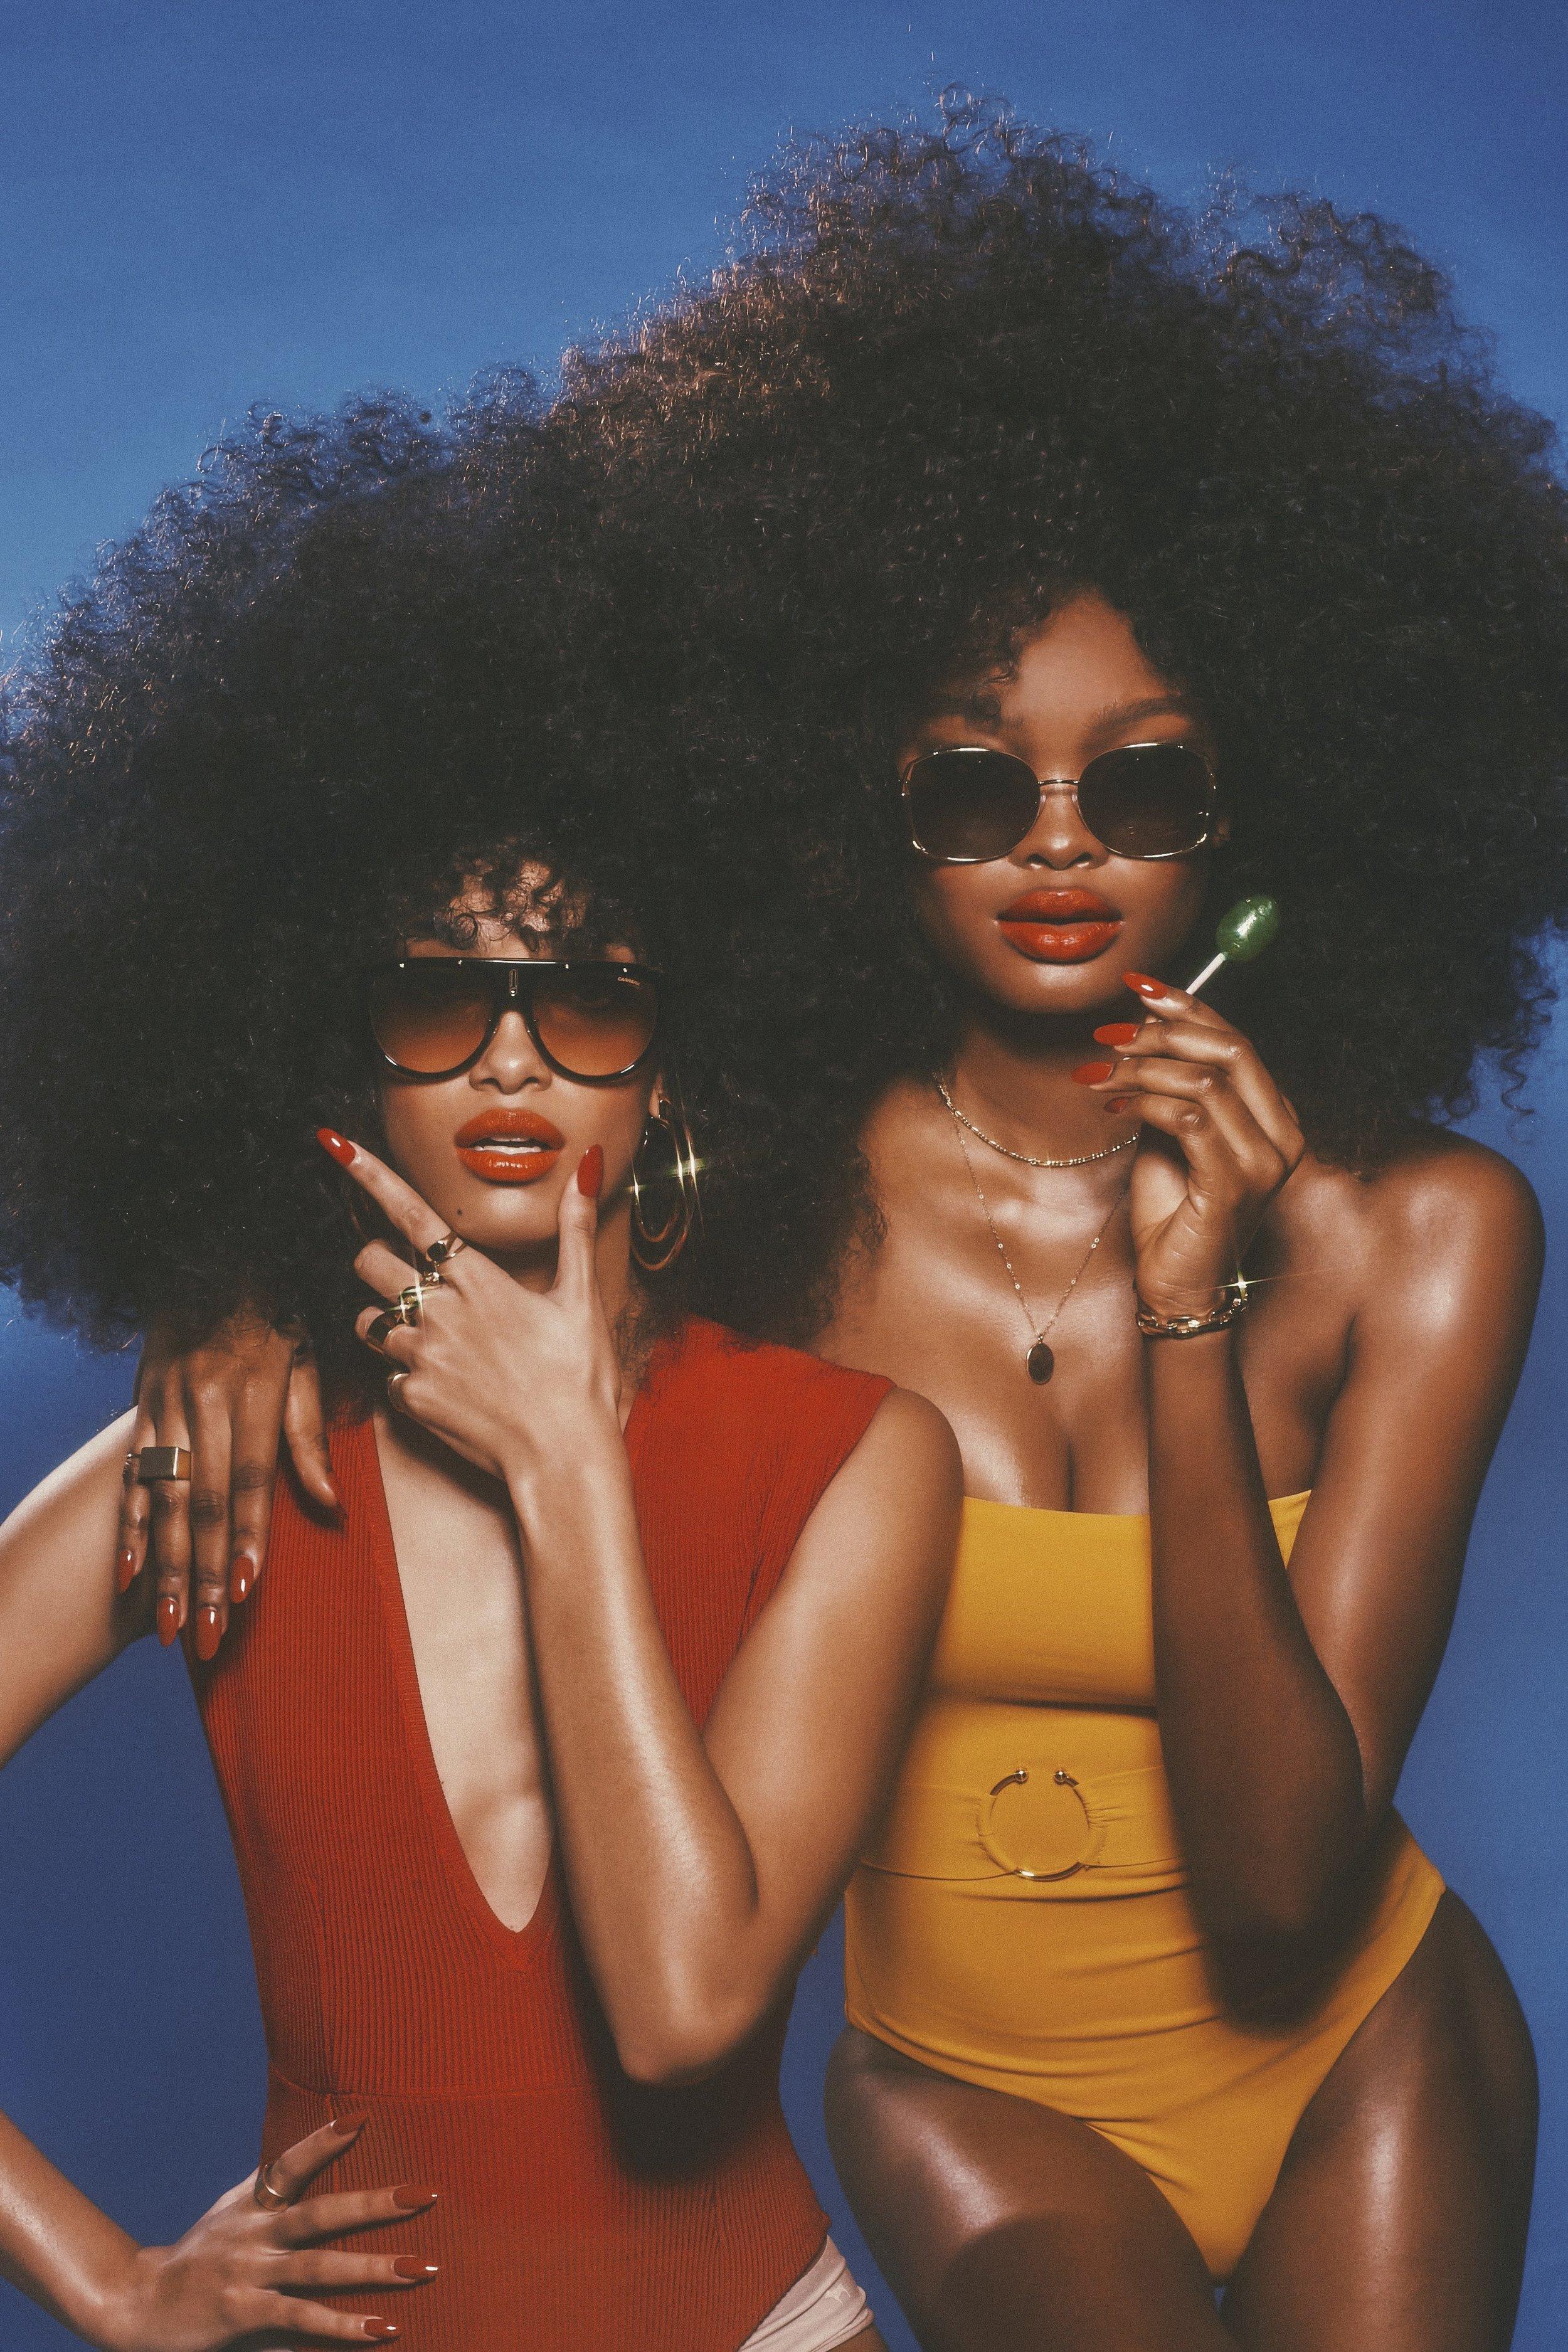 WWD 2019 Eyewear Issue, Styled by Alex Badia